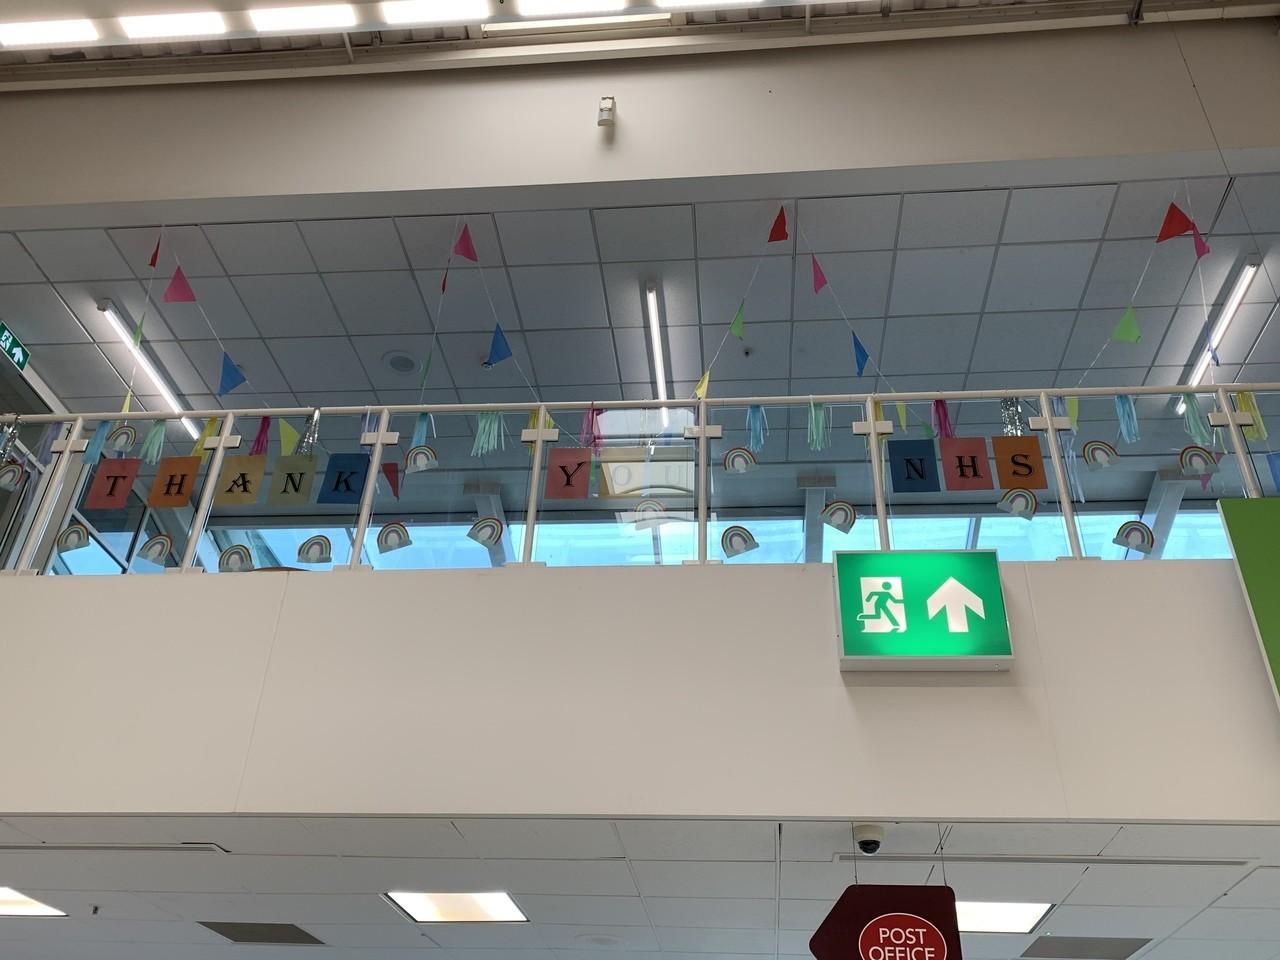 Celebrating the NHS | Asda Wigan